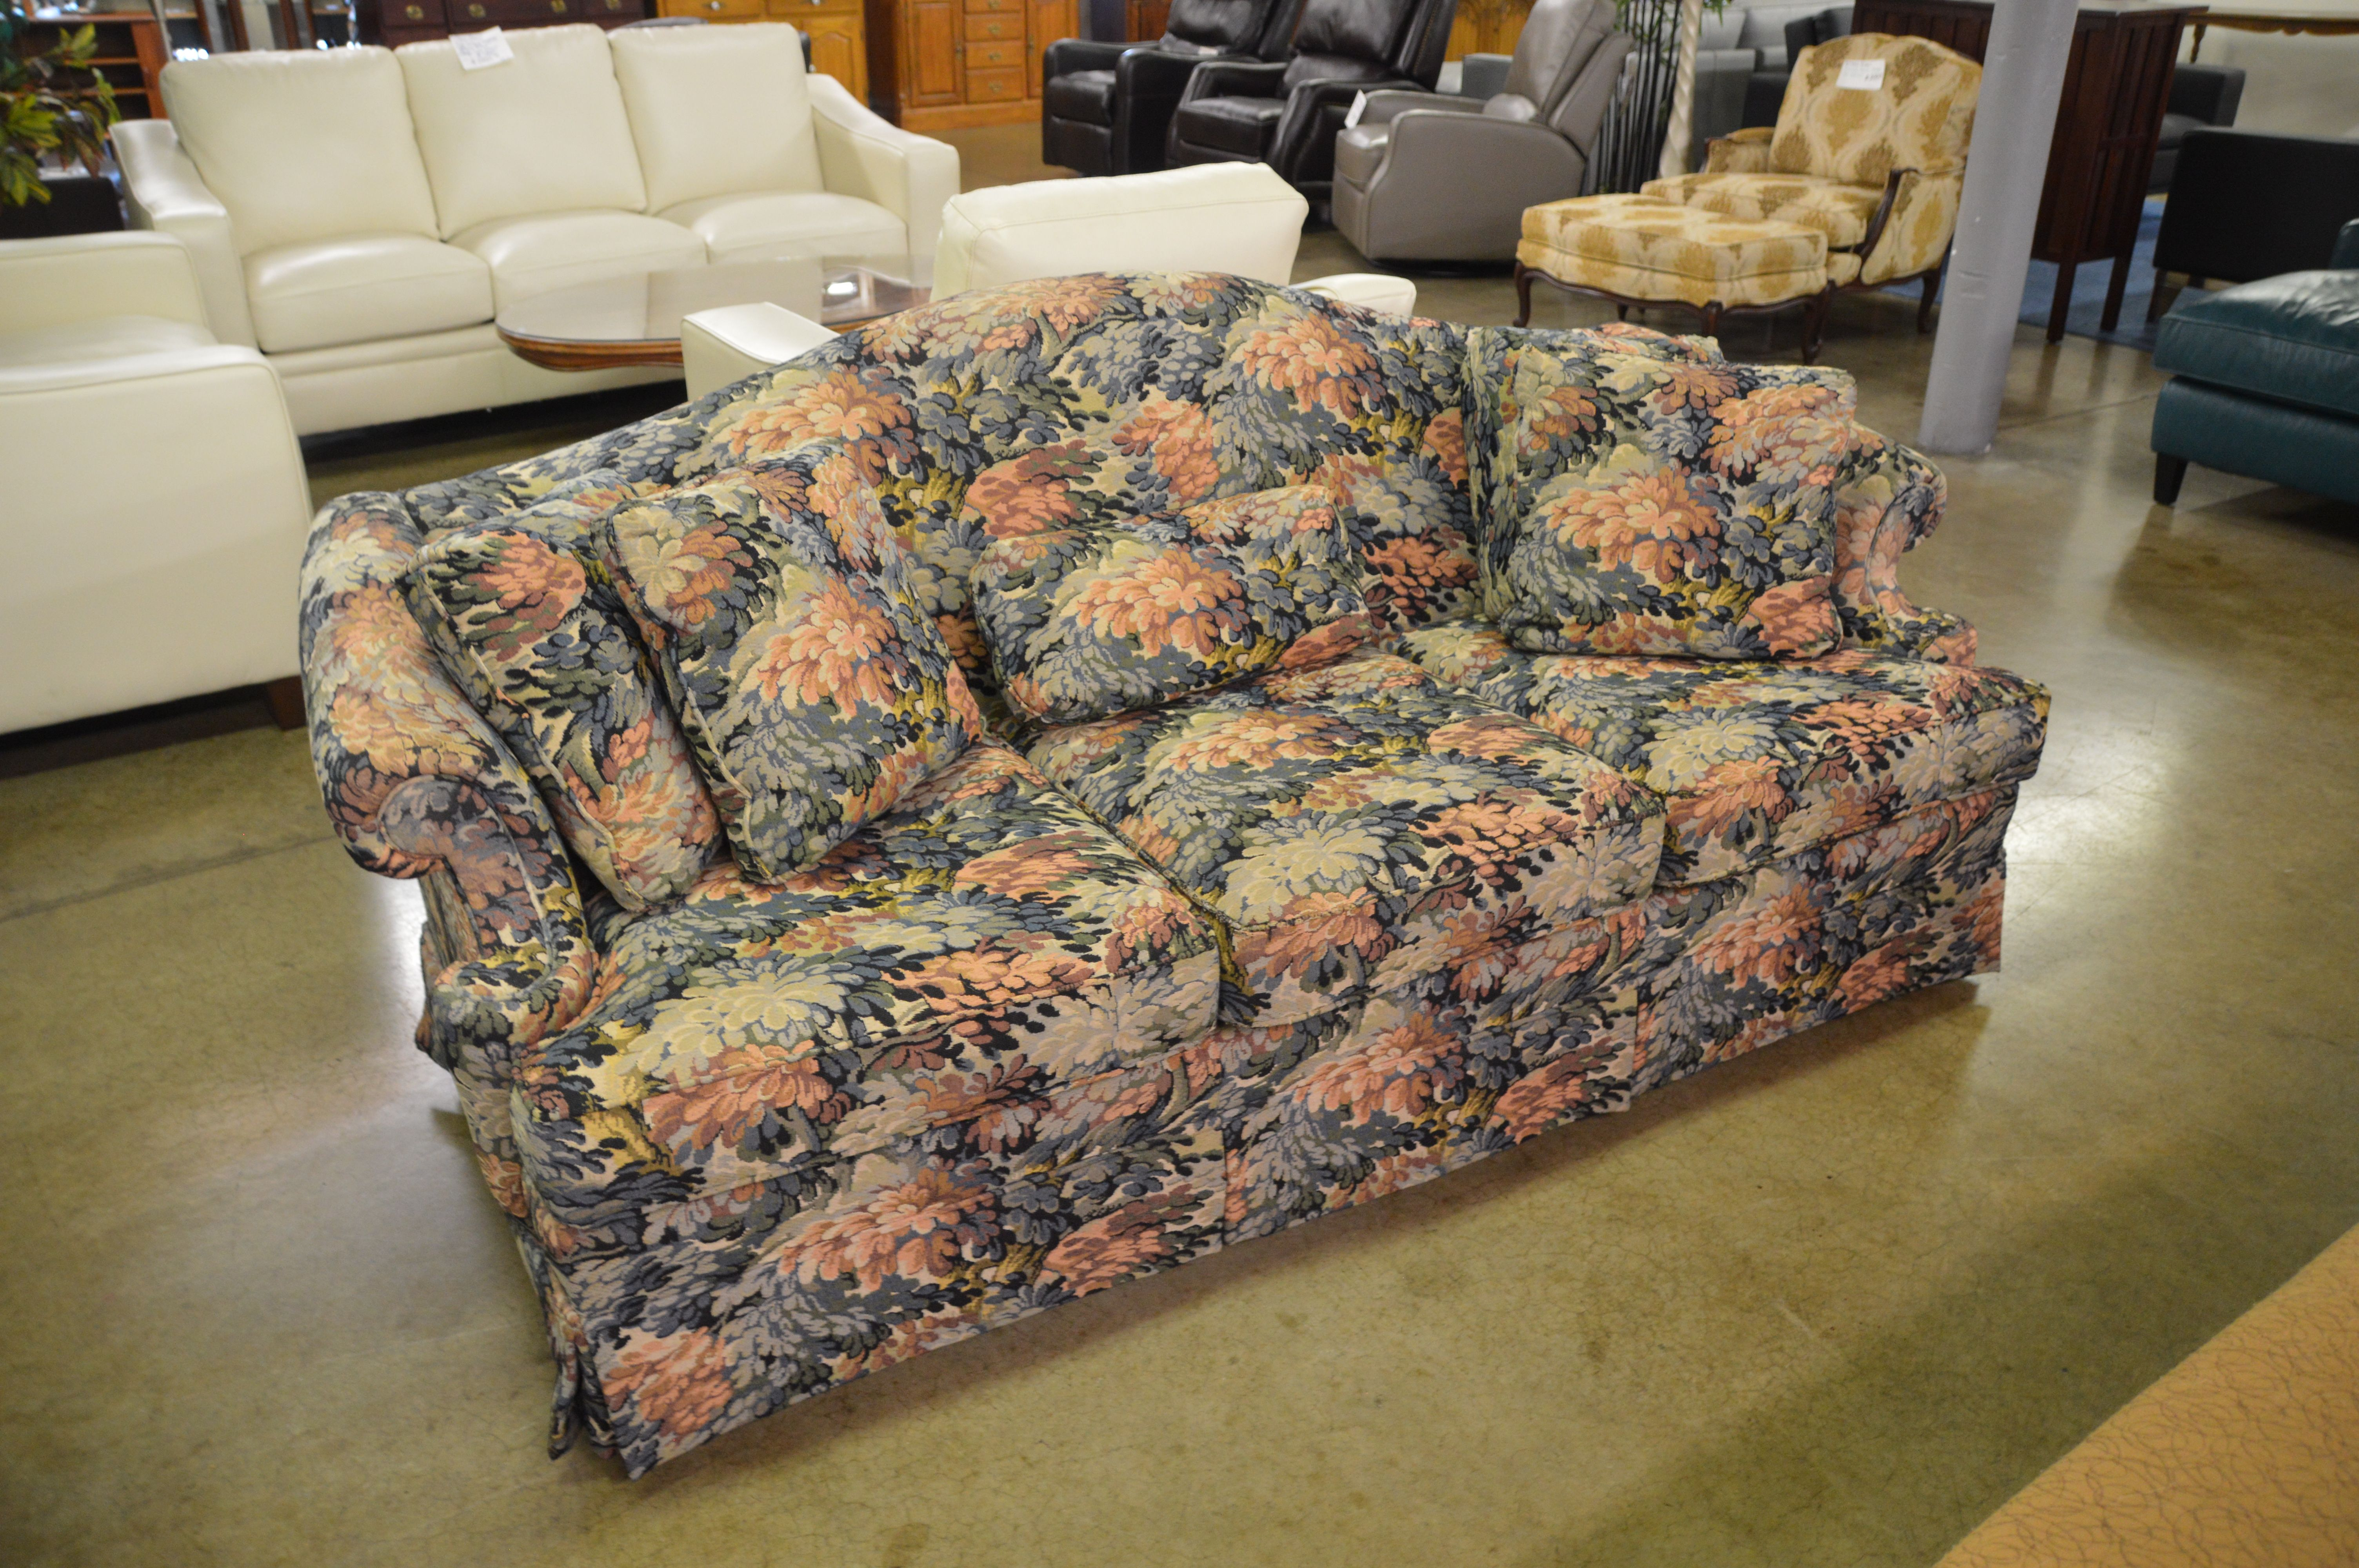 Thomasville Sofa W Leaf Pattern Very